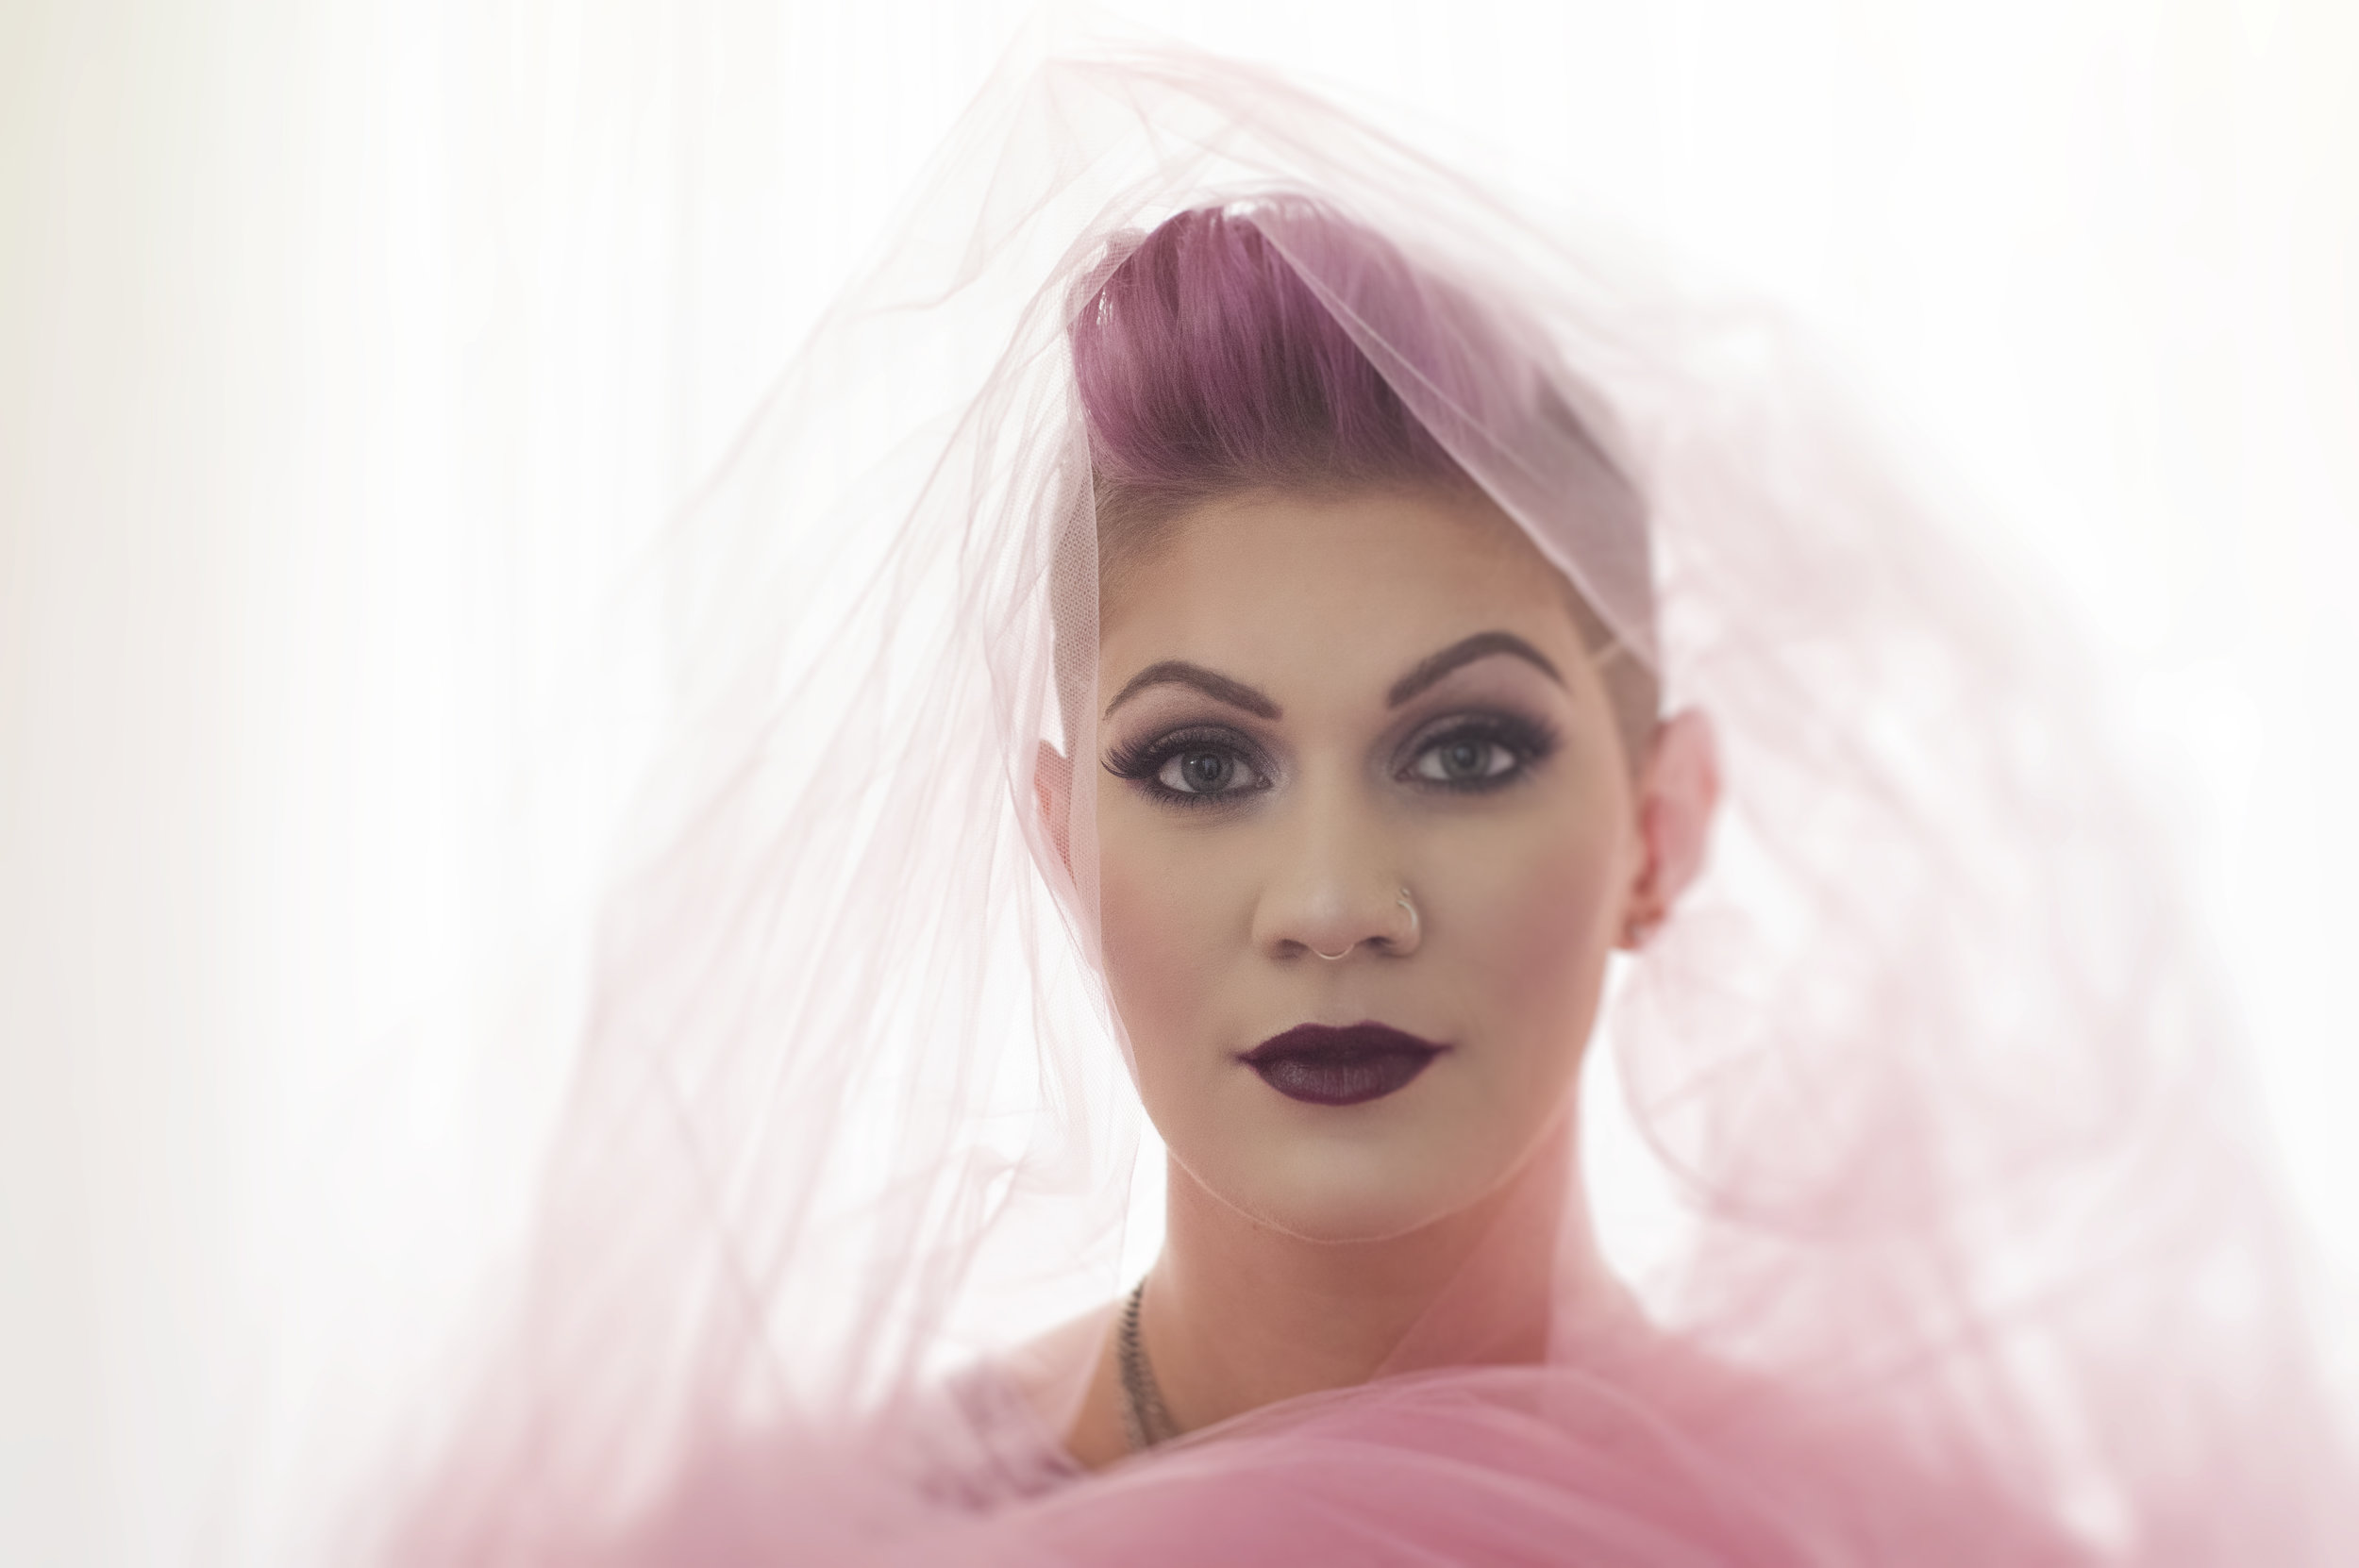 Heirloom Portrait of a Woman in Pink